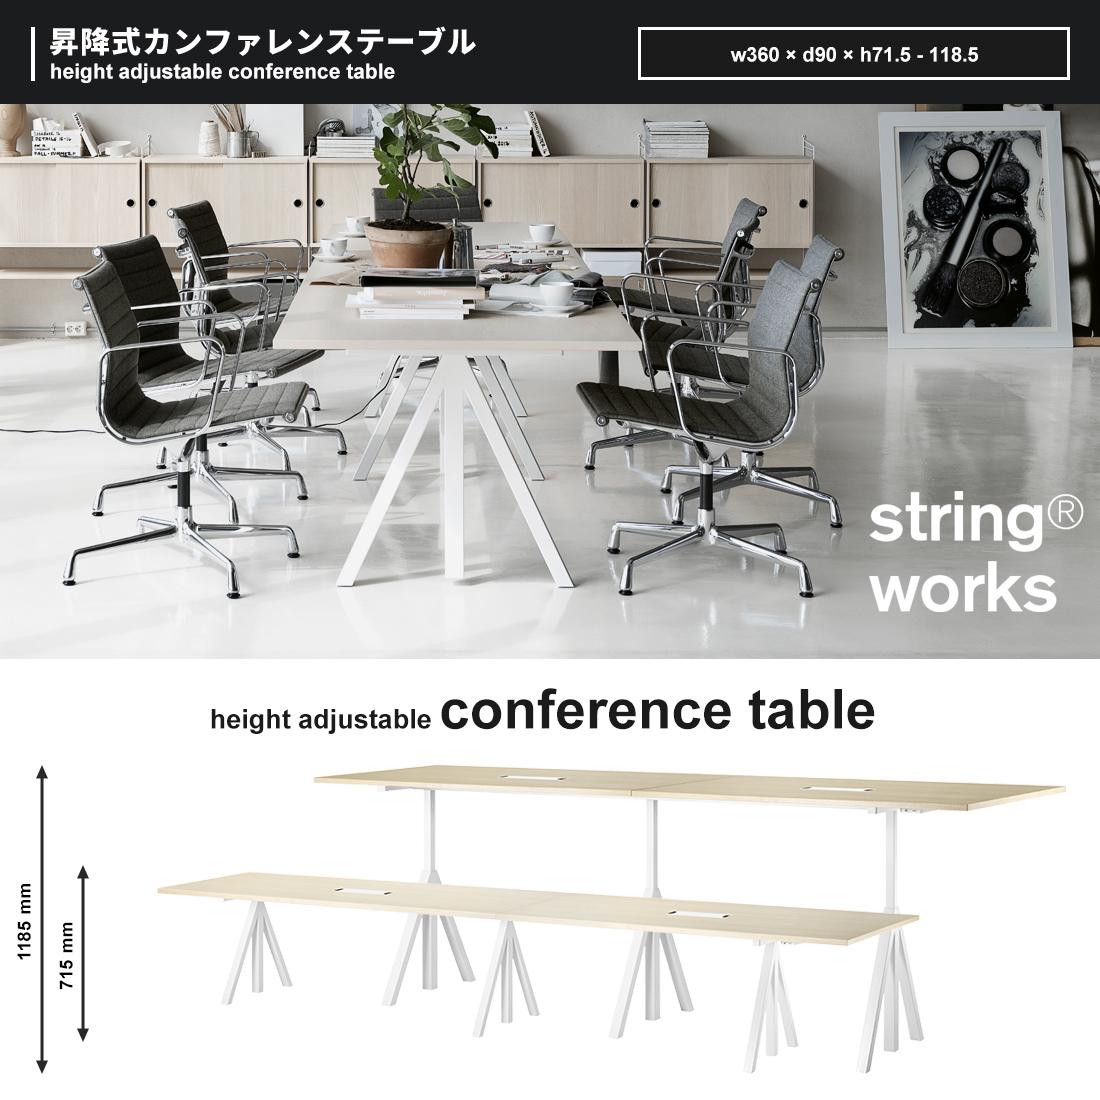 【string ストリング】string works Conference table ストリング ワークス 昇降式カンファレンステーブル机 テーブル 作業台 折りたたみ式 折り畳みテーブル ダイニングテーブル